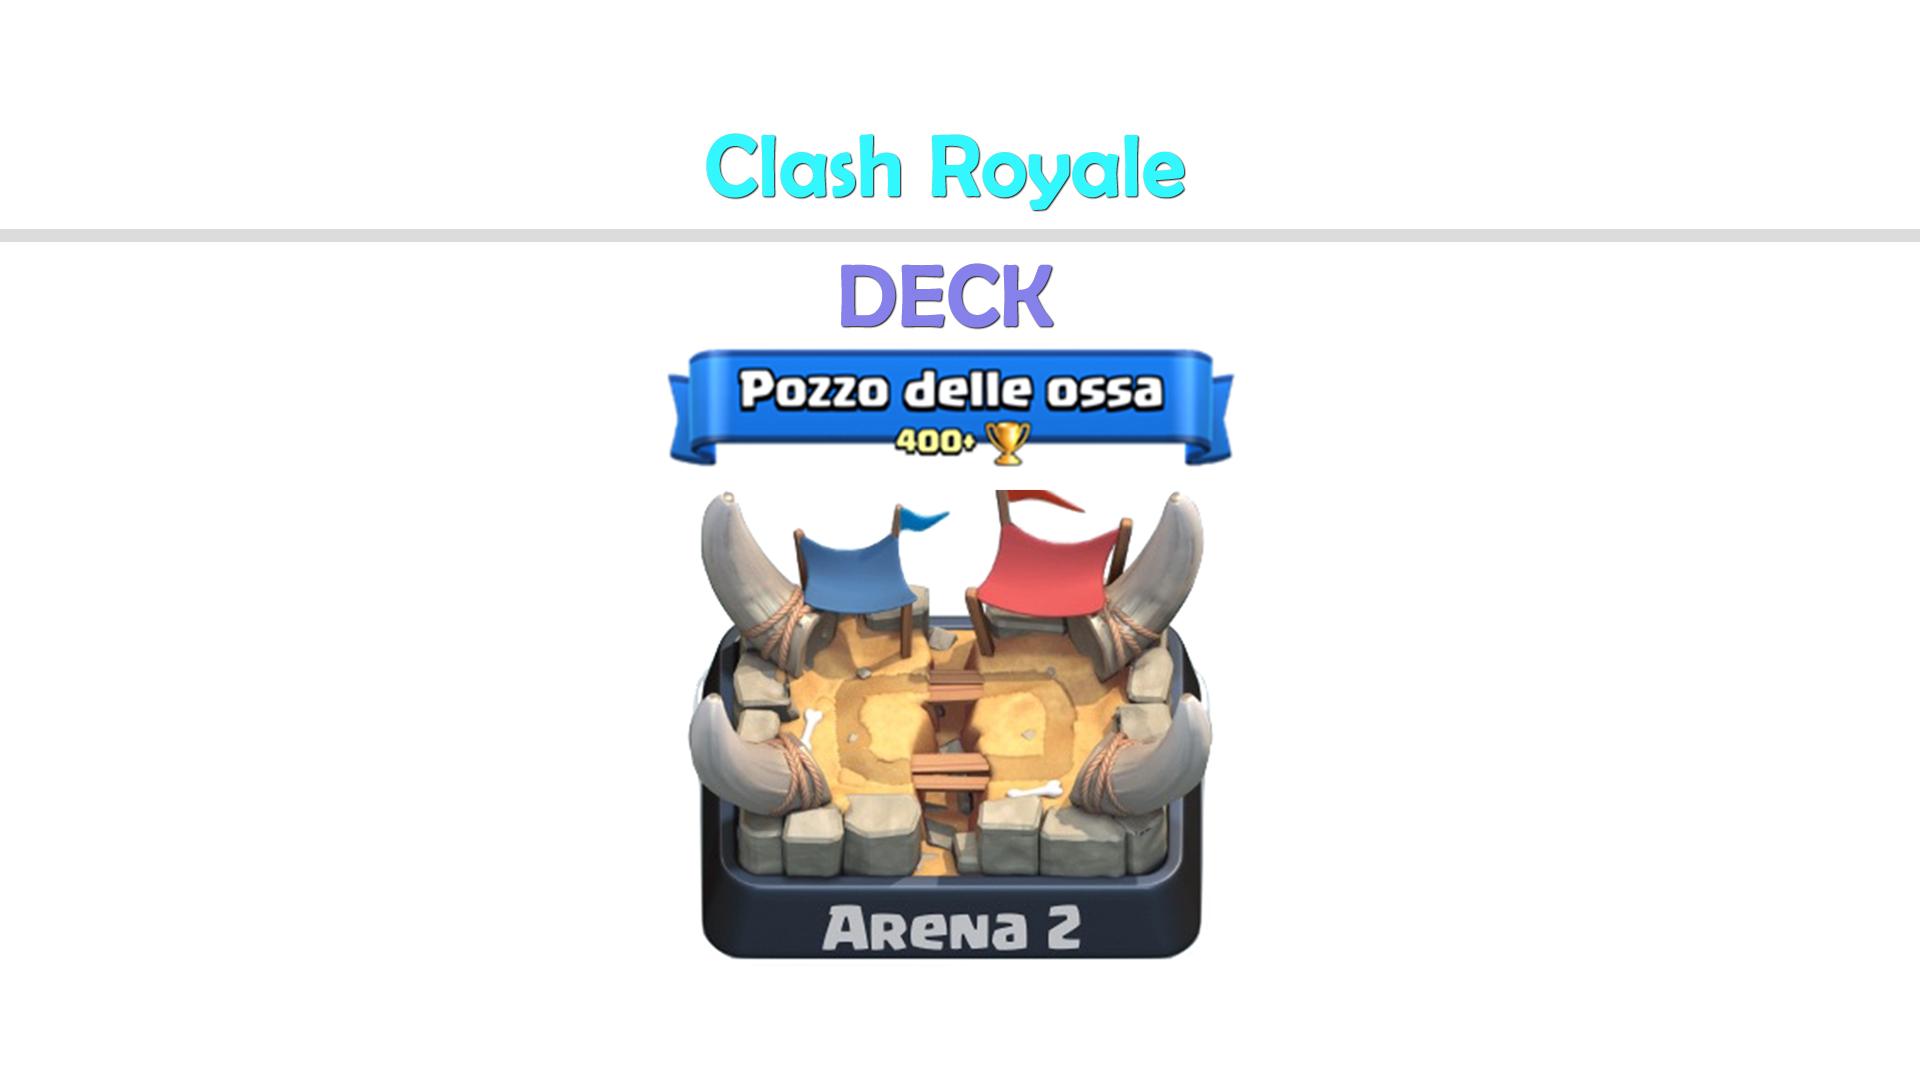 Deck Arena 2 Clash Royale